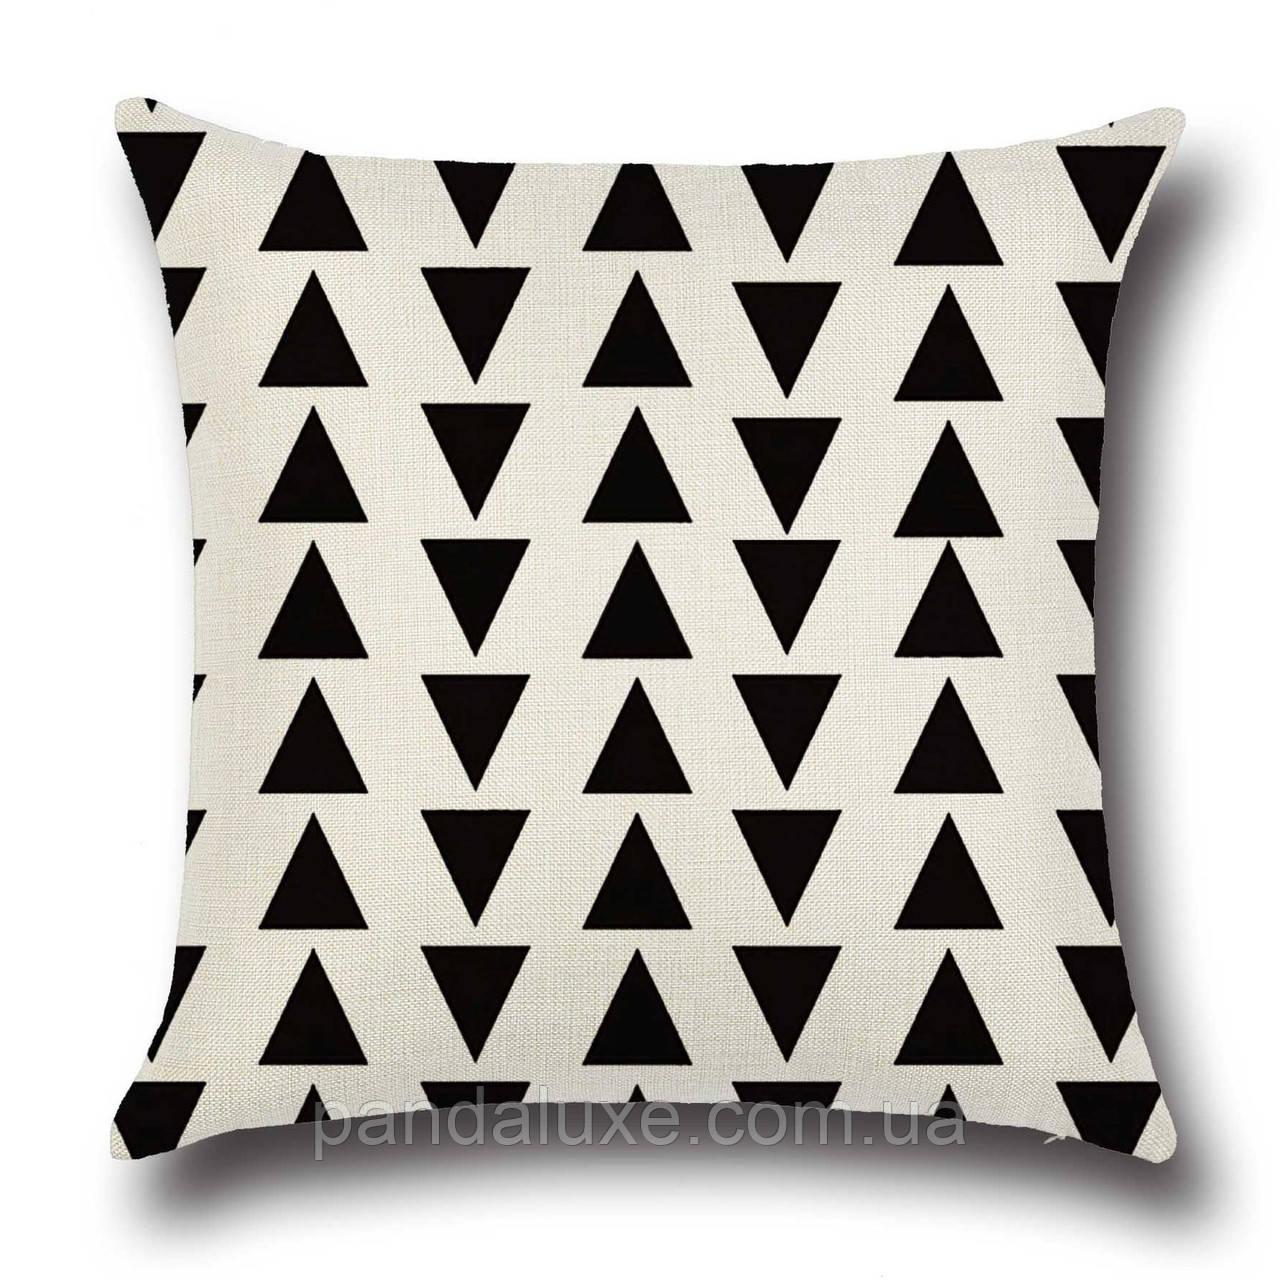 Подушка декоративная для дивана Маленькие треугольники 45 х 45 см